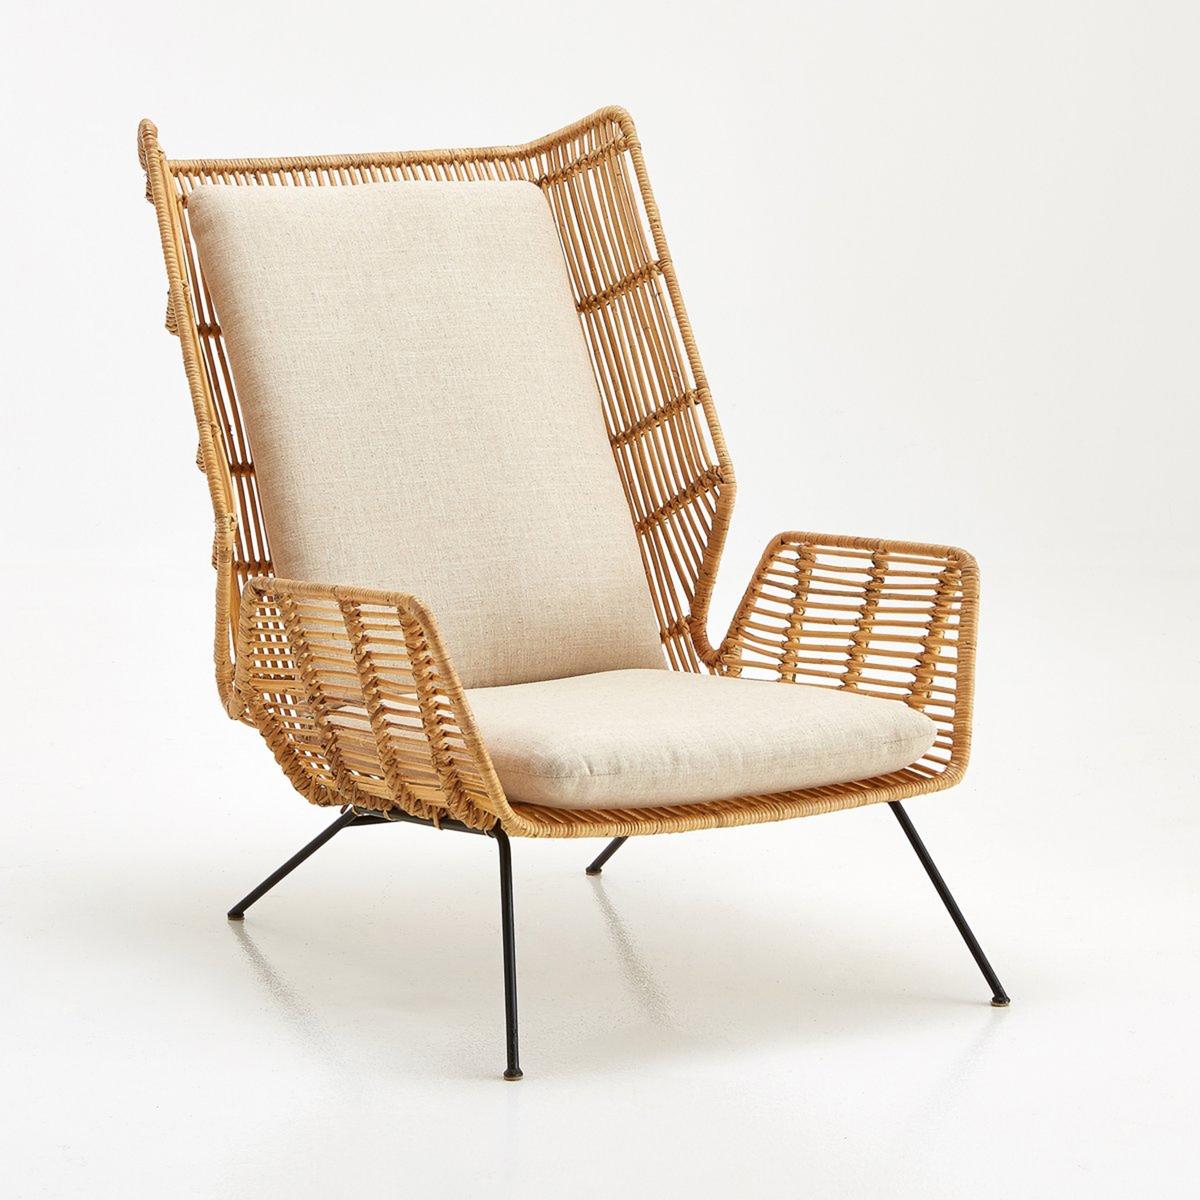 Кресло LaRedoute Malu единый размер бежевый скамья laredoute из ротанга malu единый размер бежевый